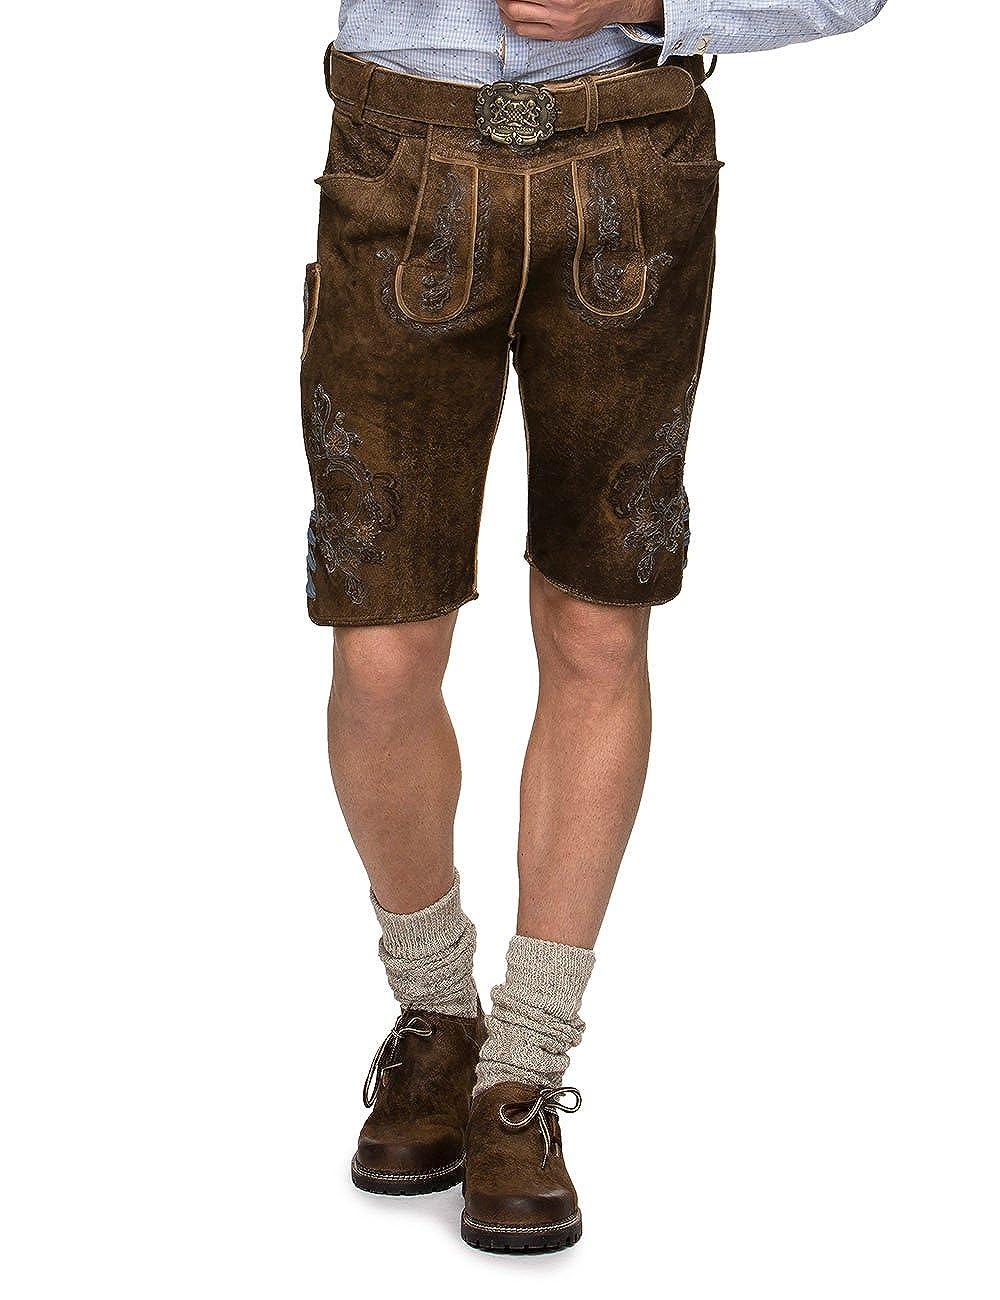 brown (Biber blue) W52 Stockerpoint Men's Hose Aron Traditional Costume Lederhose